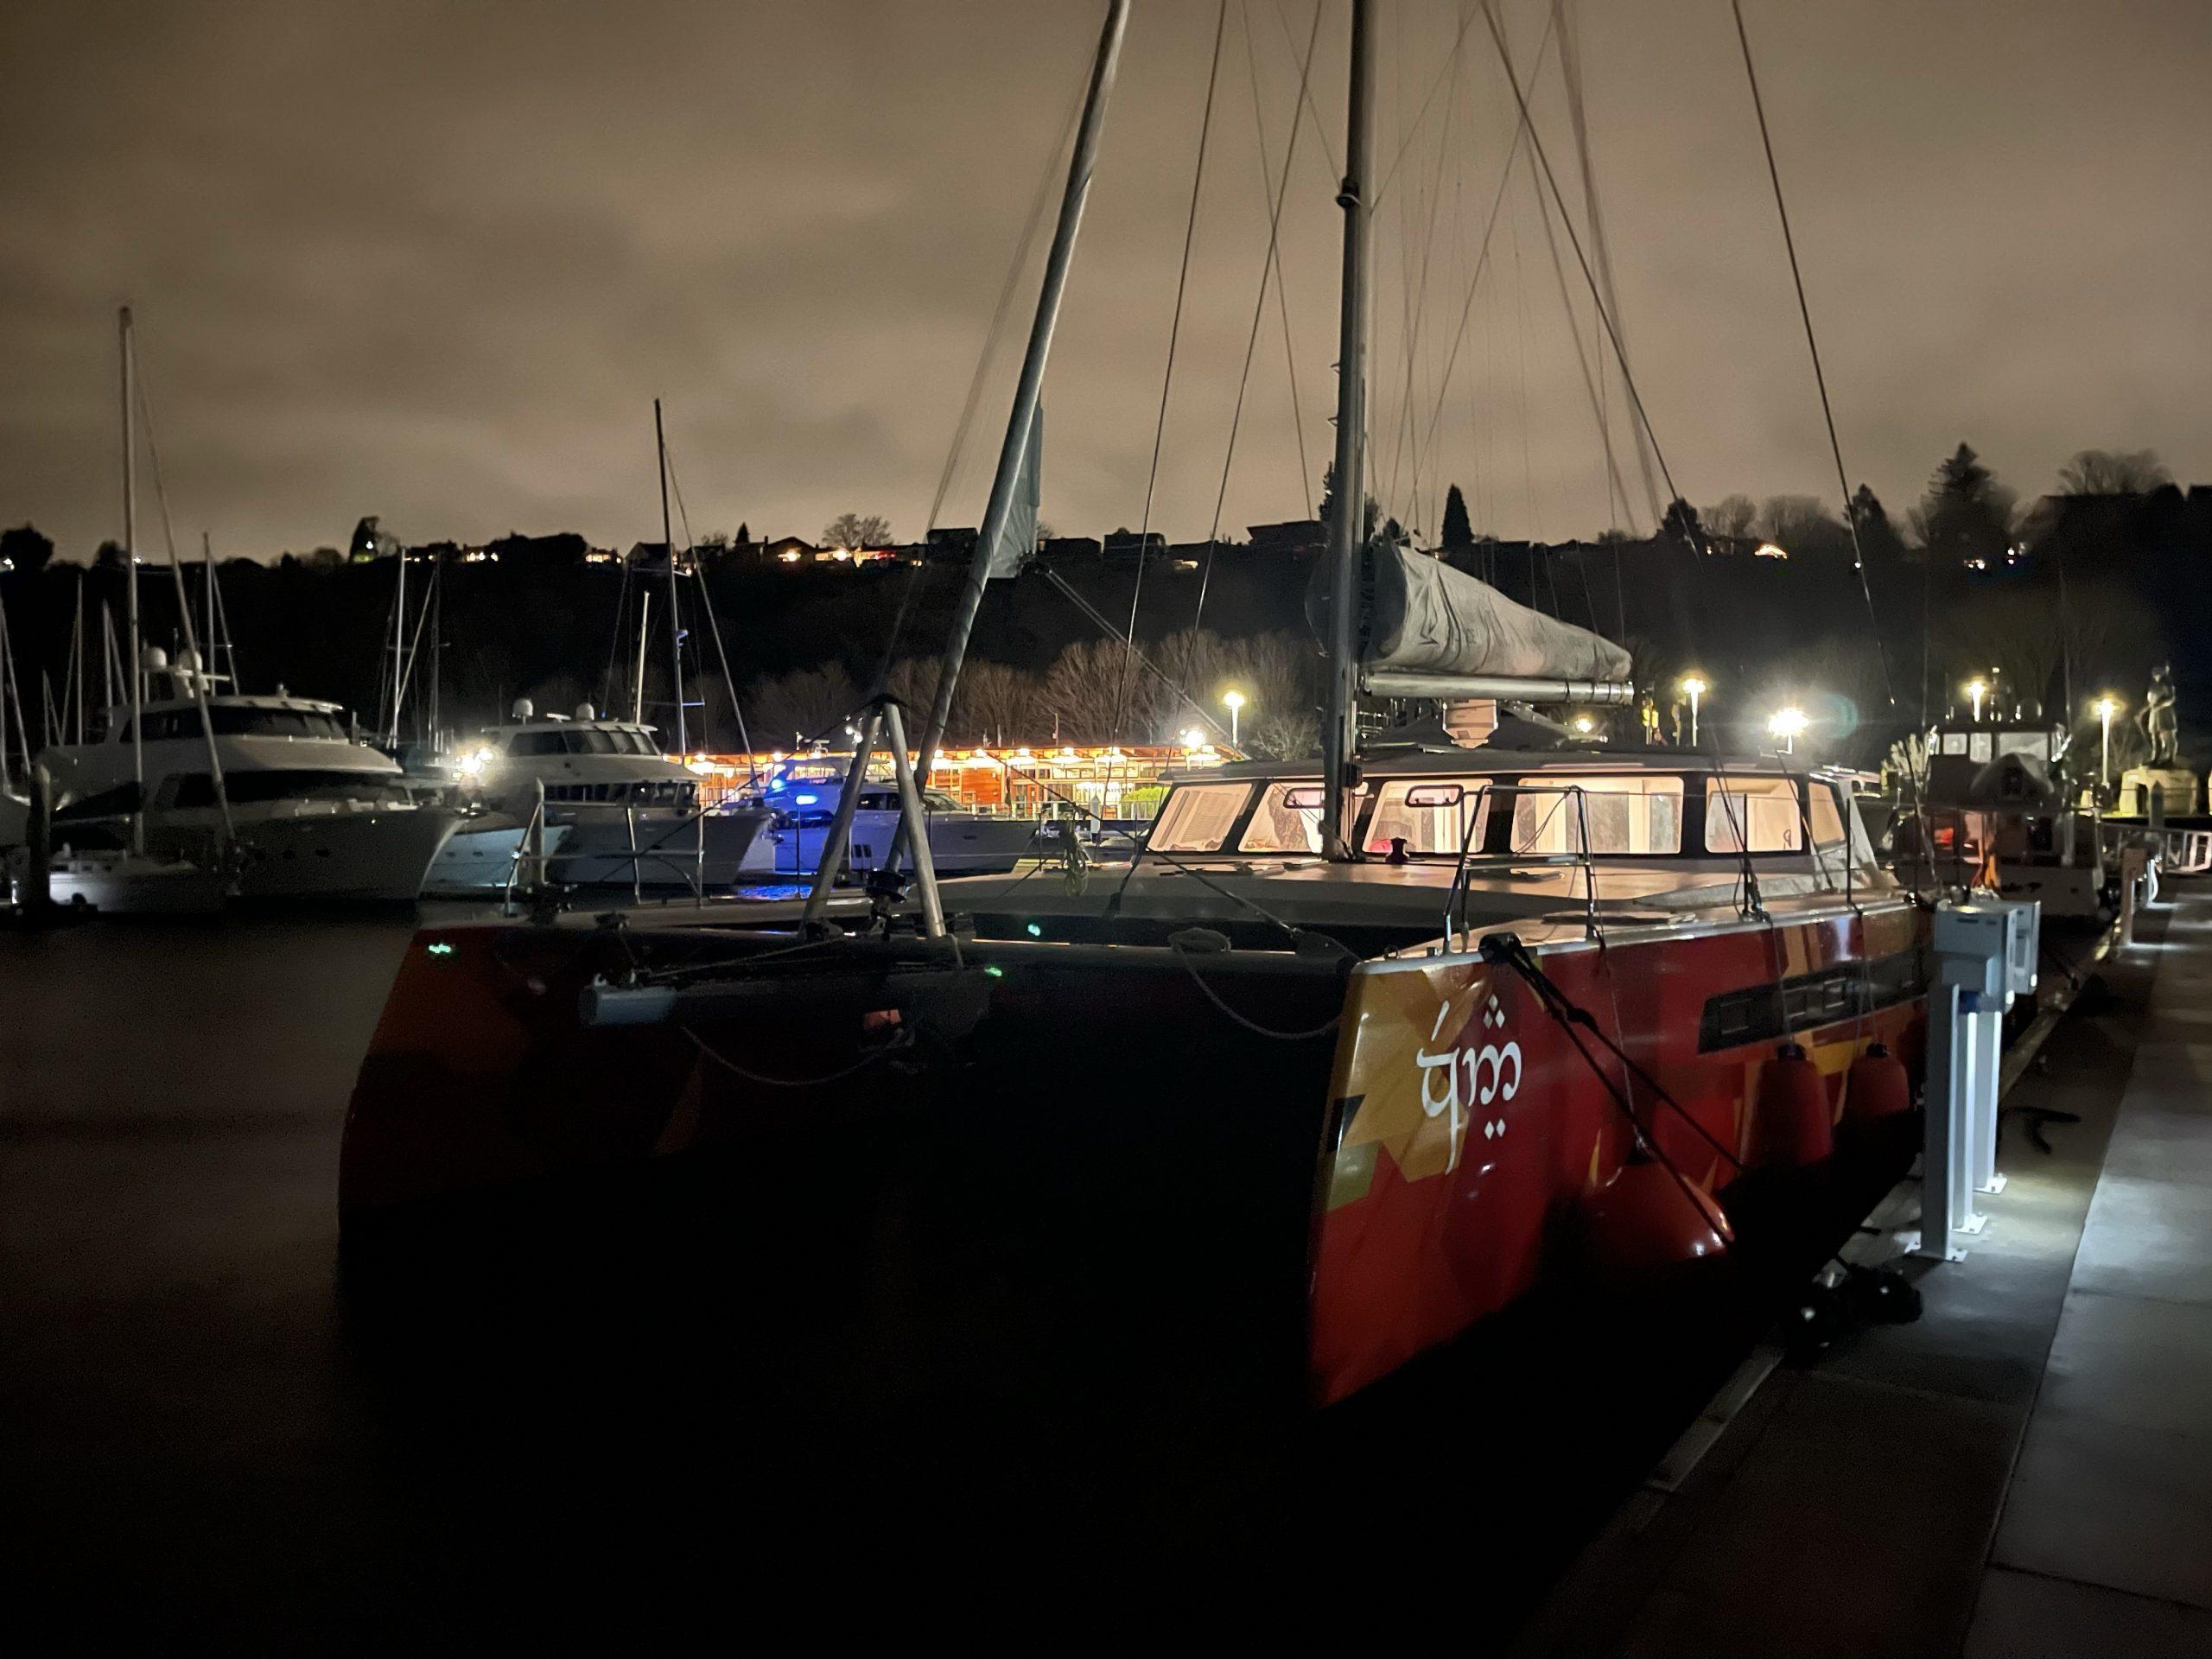 Vingilótë and her crew made it to Shilshole marina safe and sound